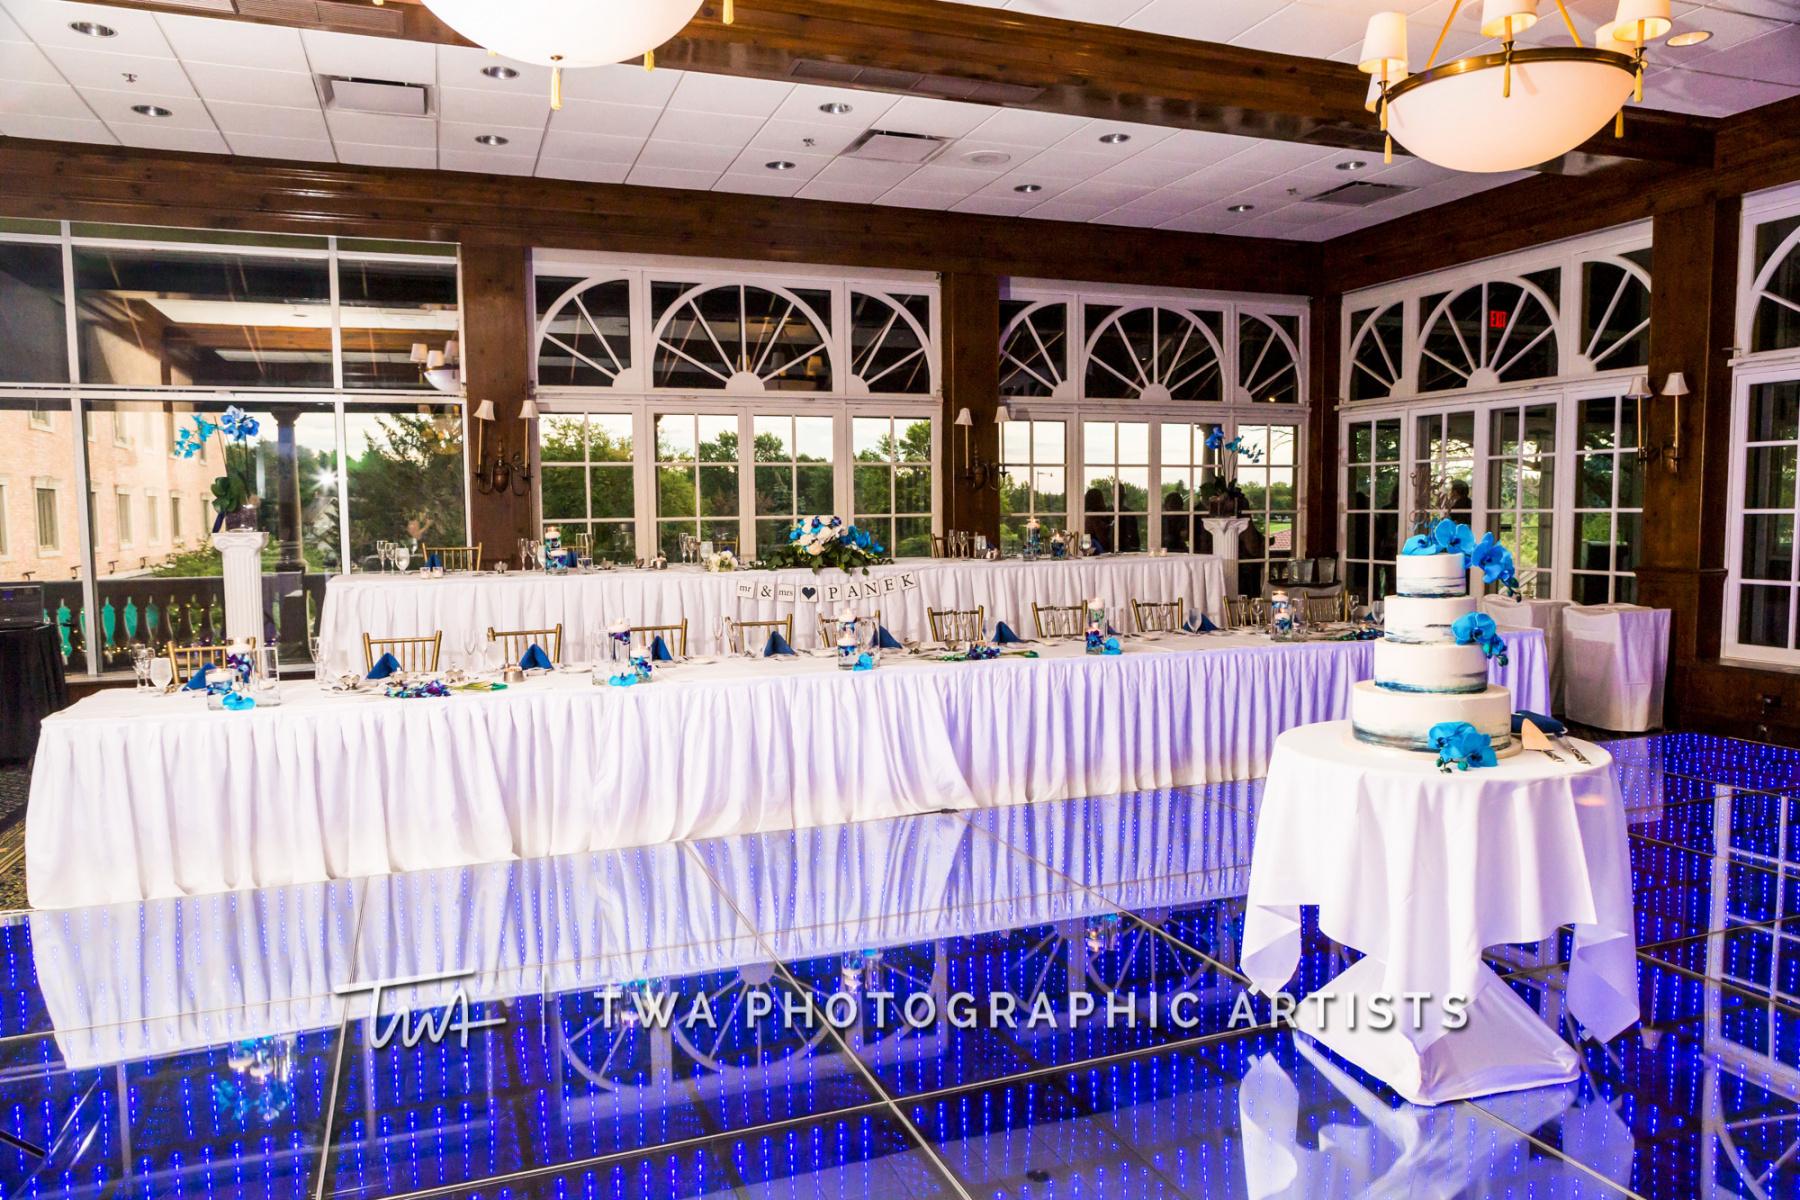 Chicago-Wedding-Photographer-TWA-Photographic-Artists-Drake-Oak-Brook_Church_Panek_HM-0630